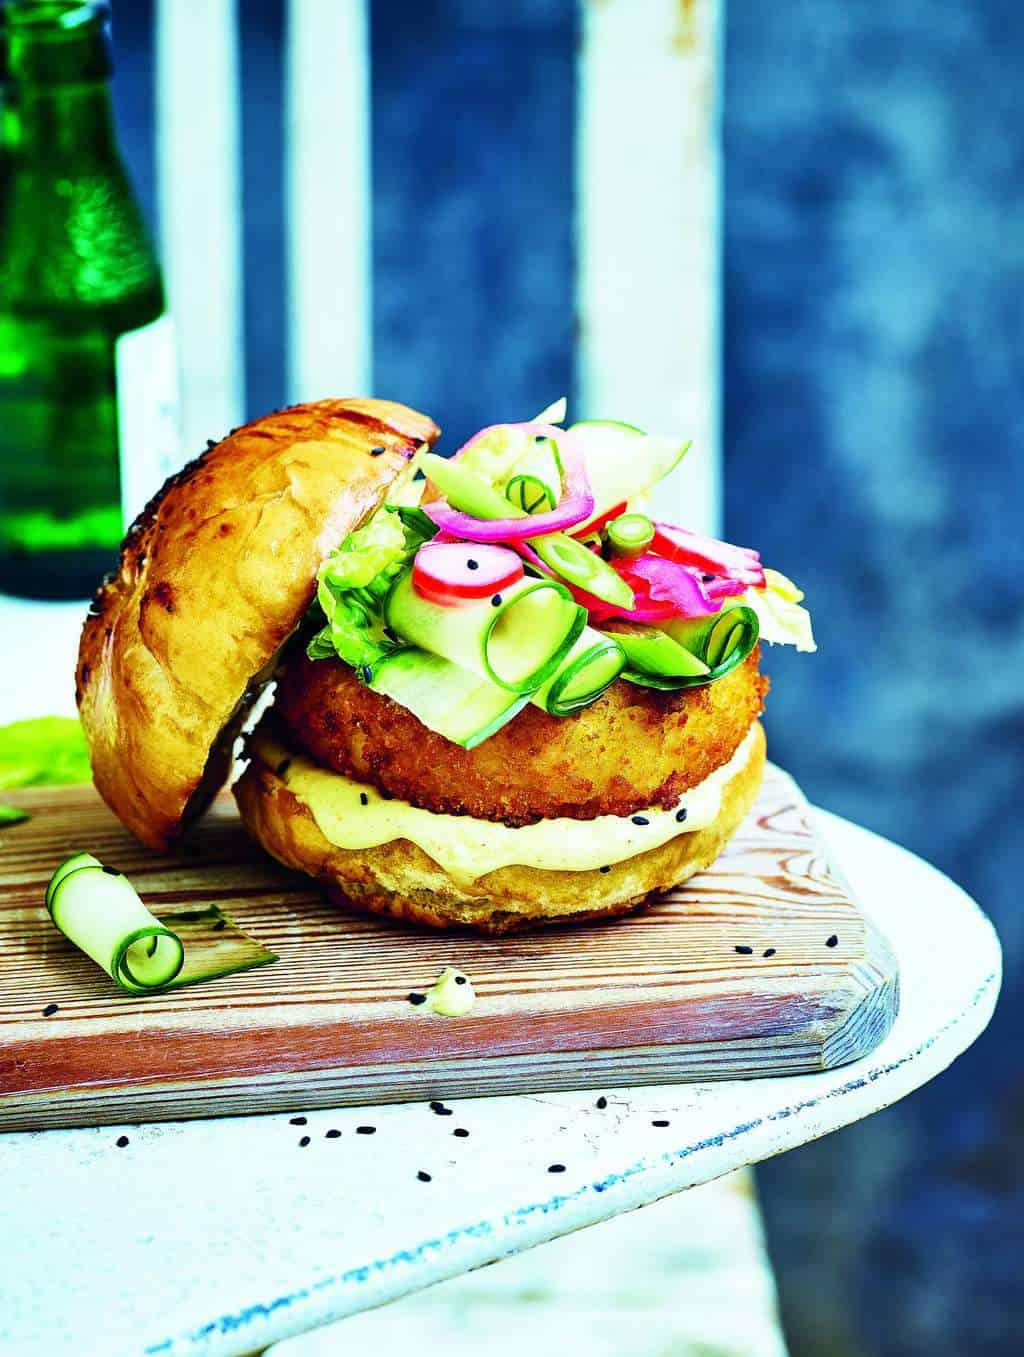 Vegan burger by Gaz Oakley